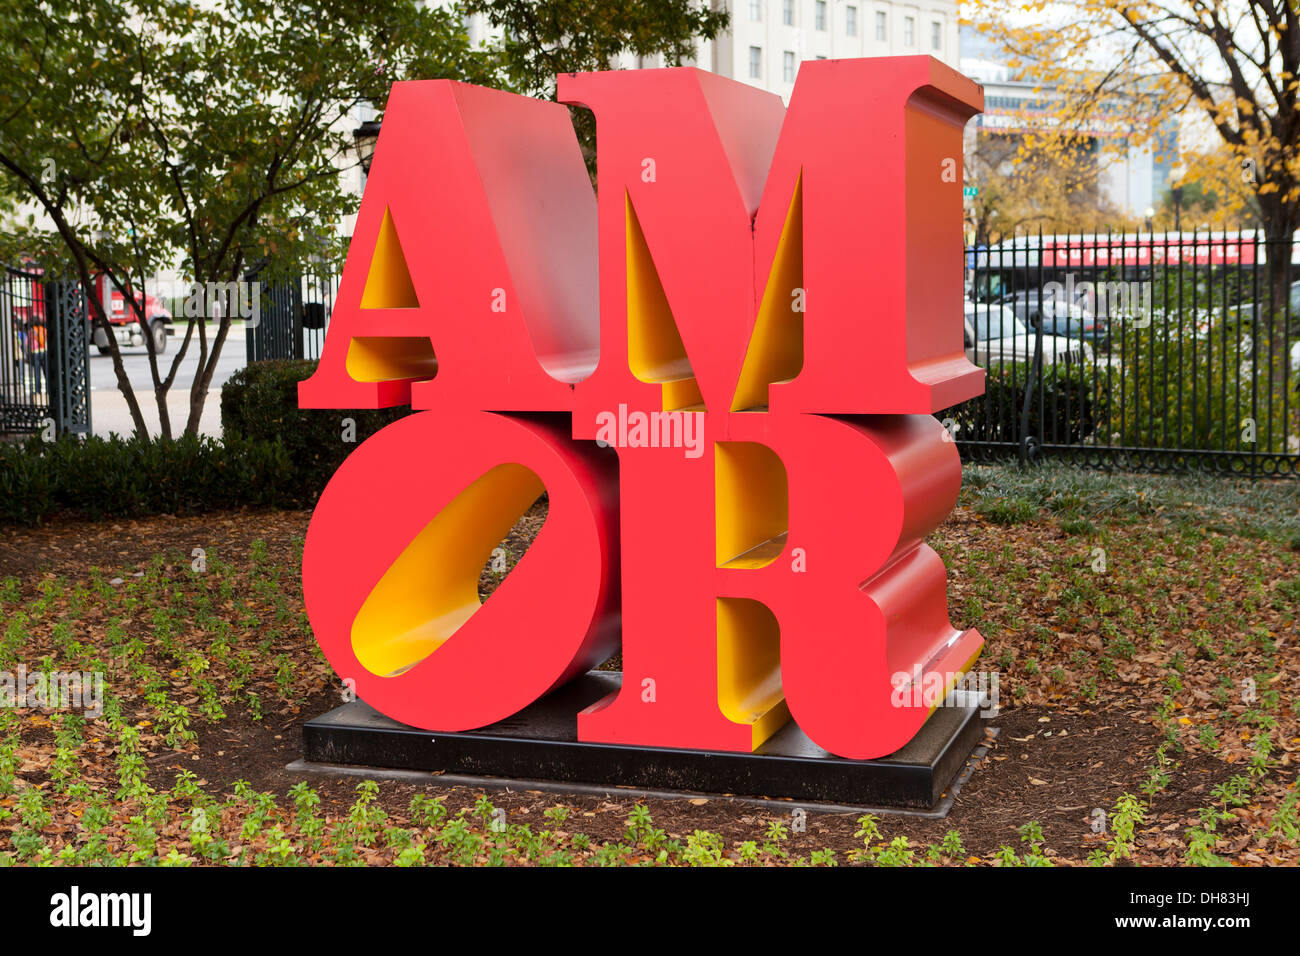 AMOR sculpture by Robert Indiana, 2006 - USA - Stock Image